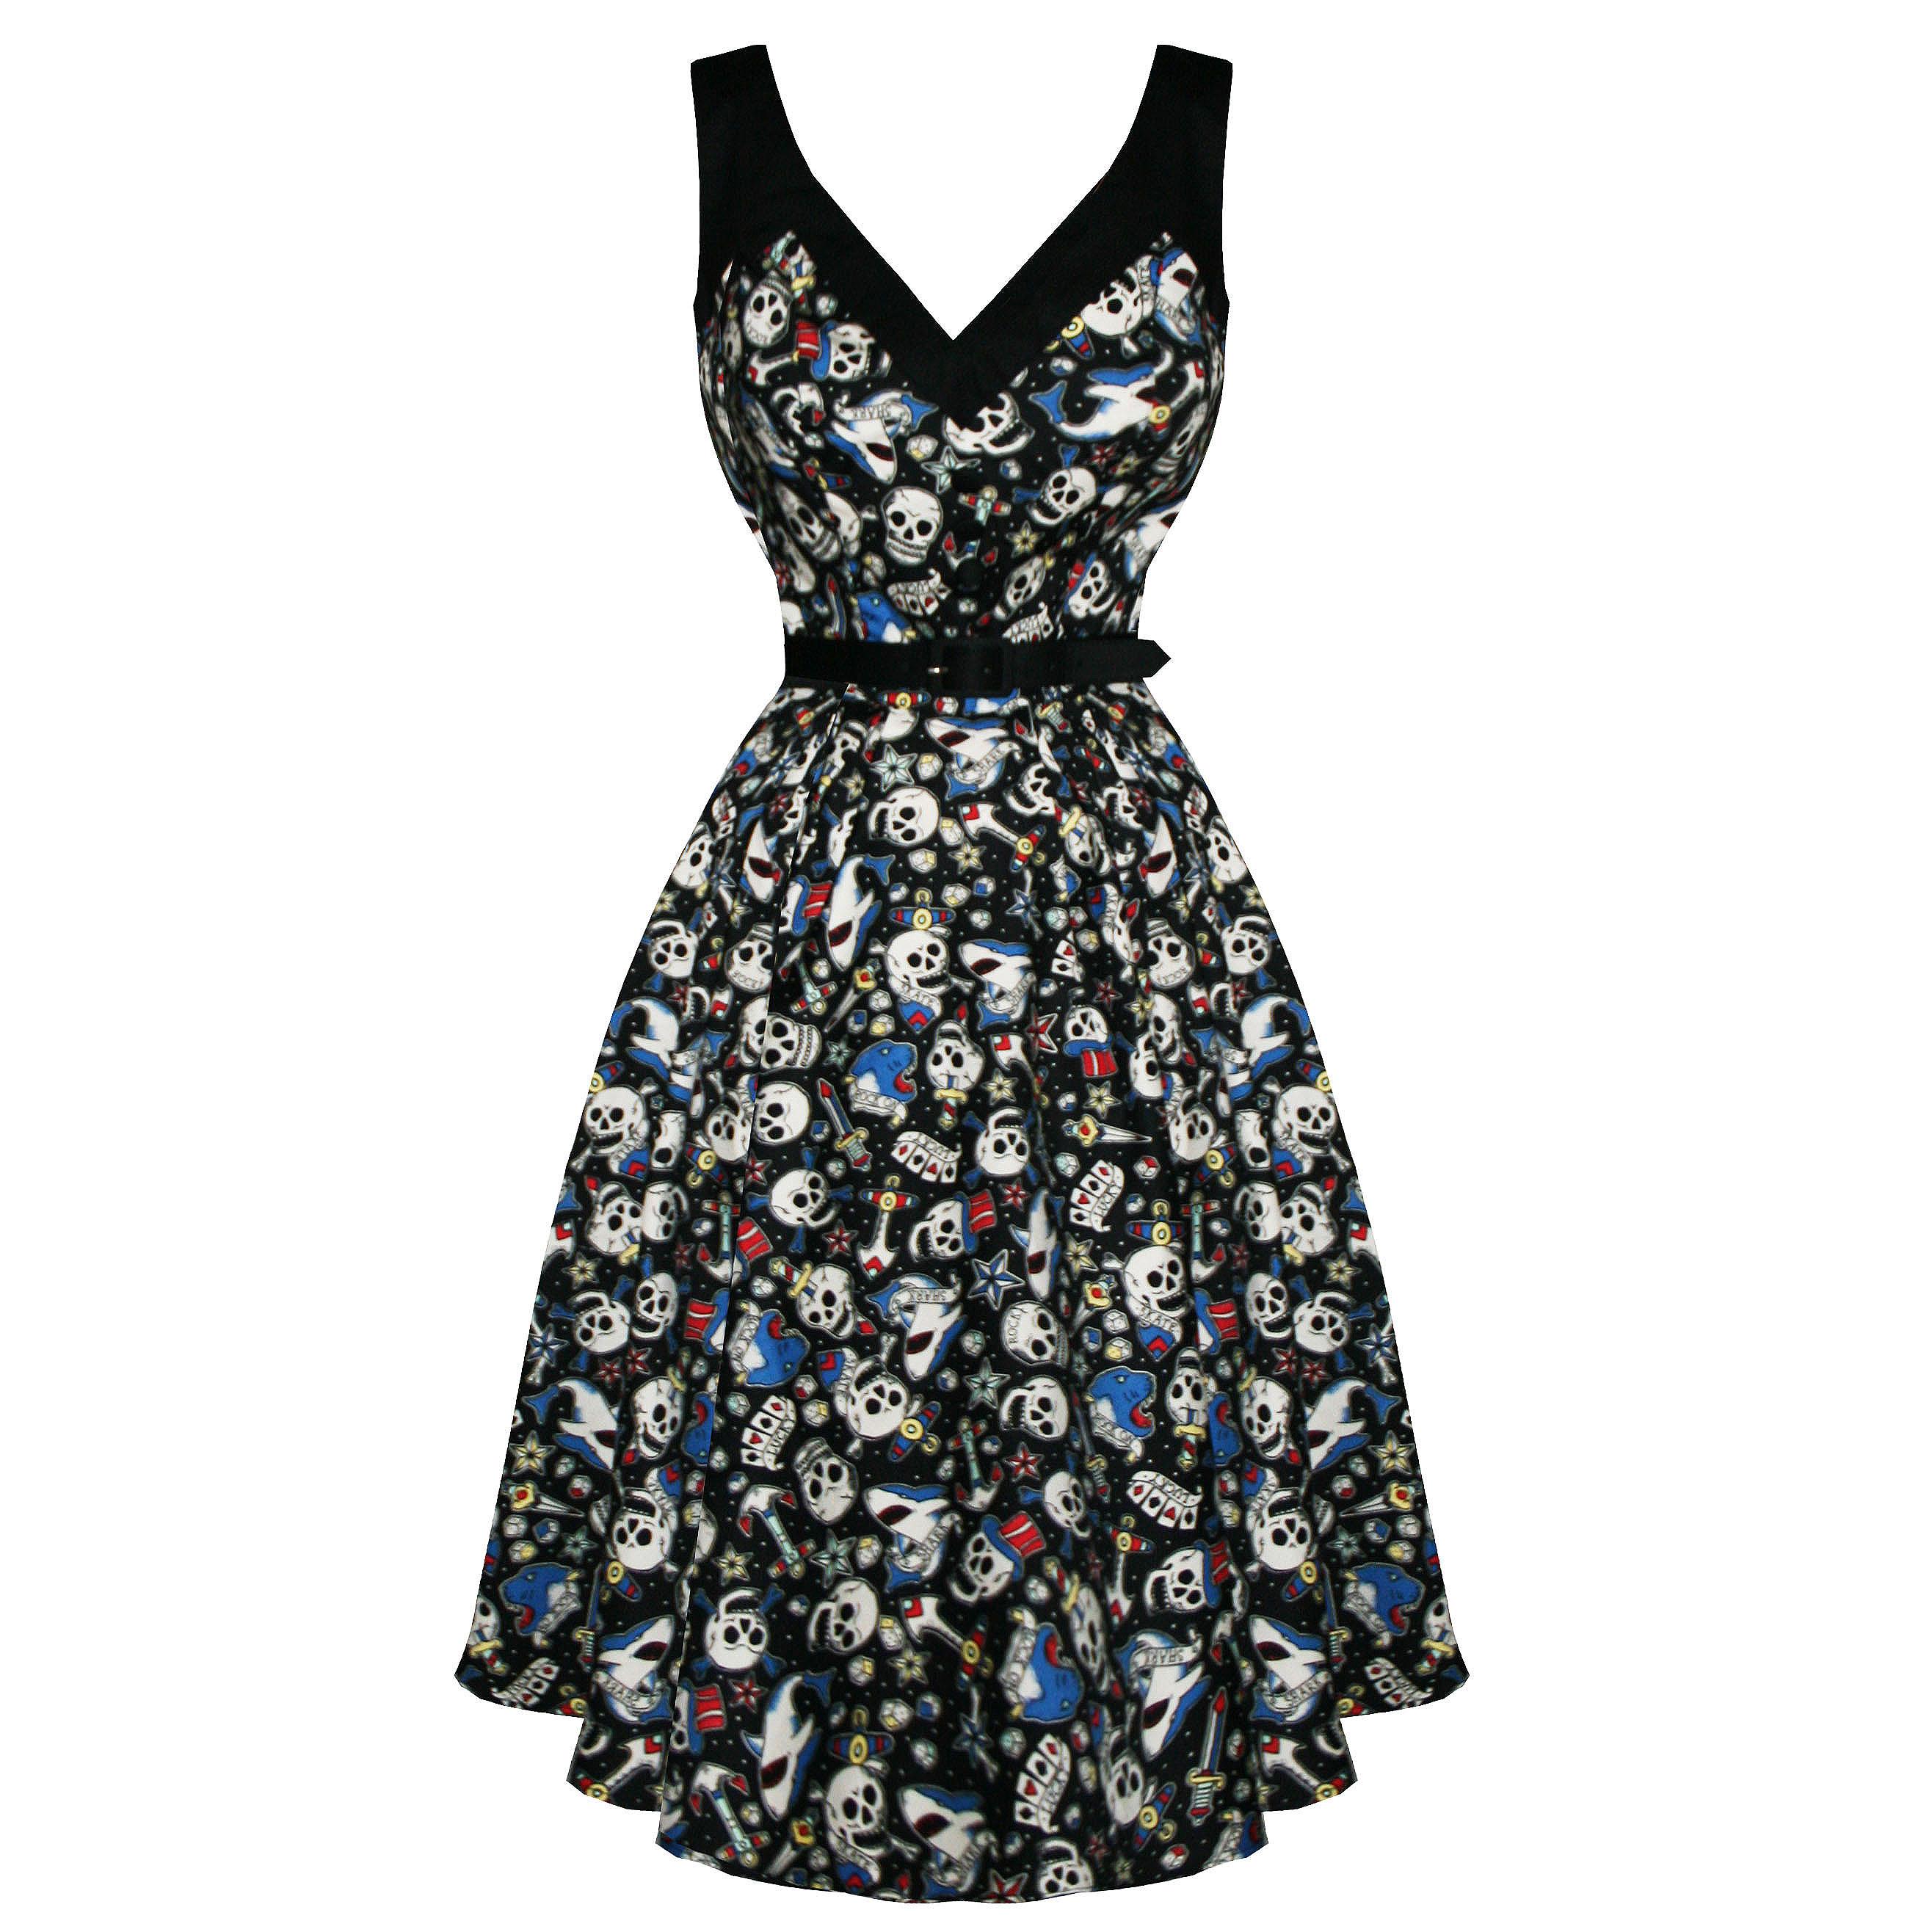 Rockabilly clothing online australia